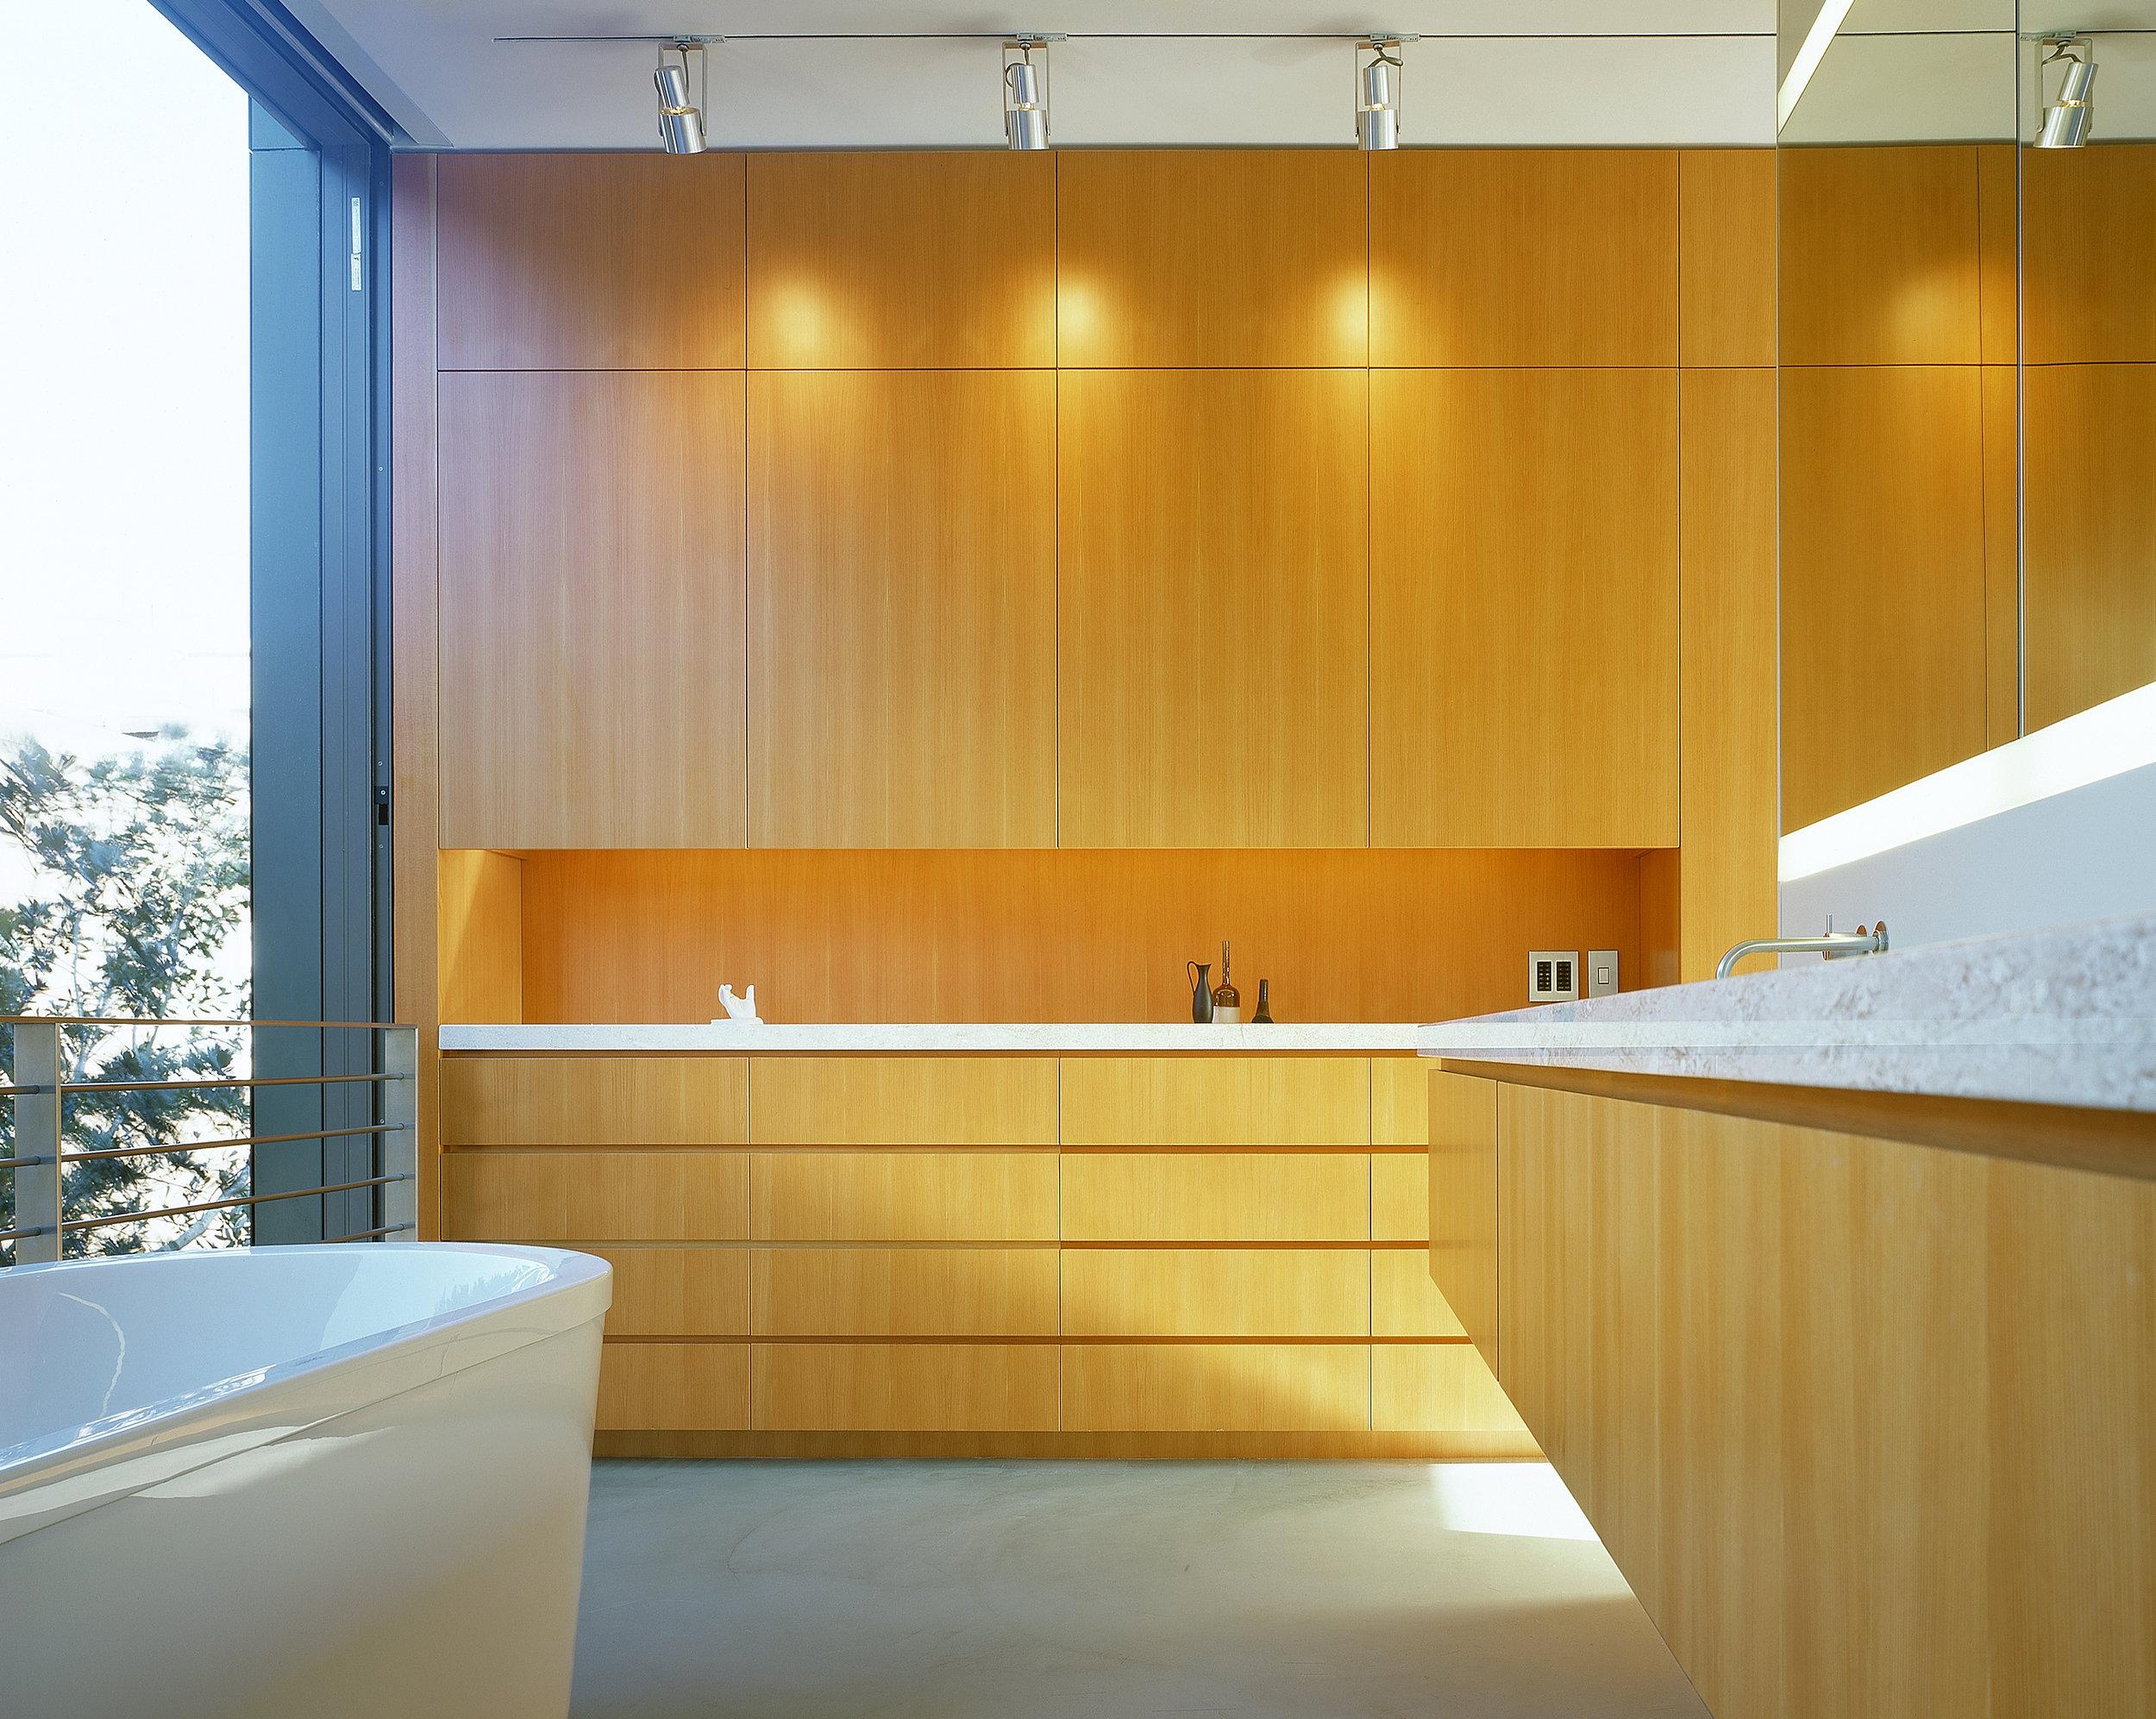 17 Bathroom_I_bdr_SR.V2 .jpg